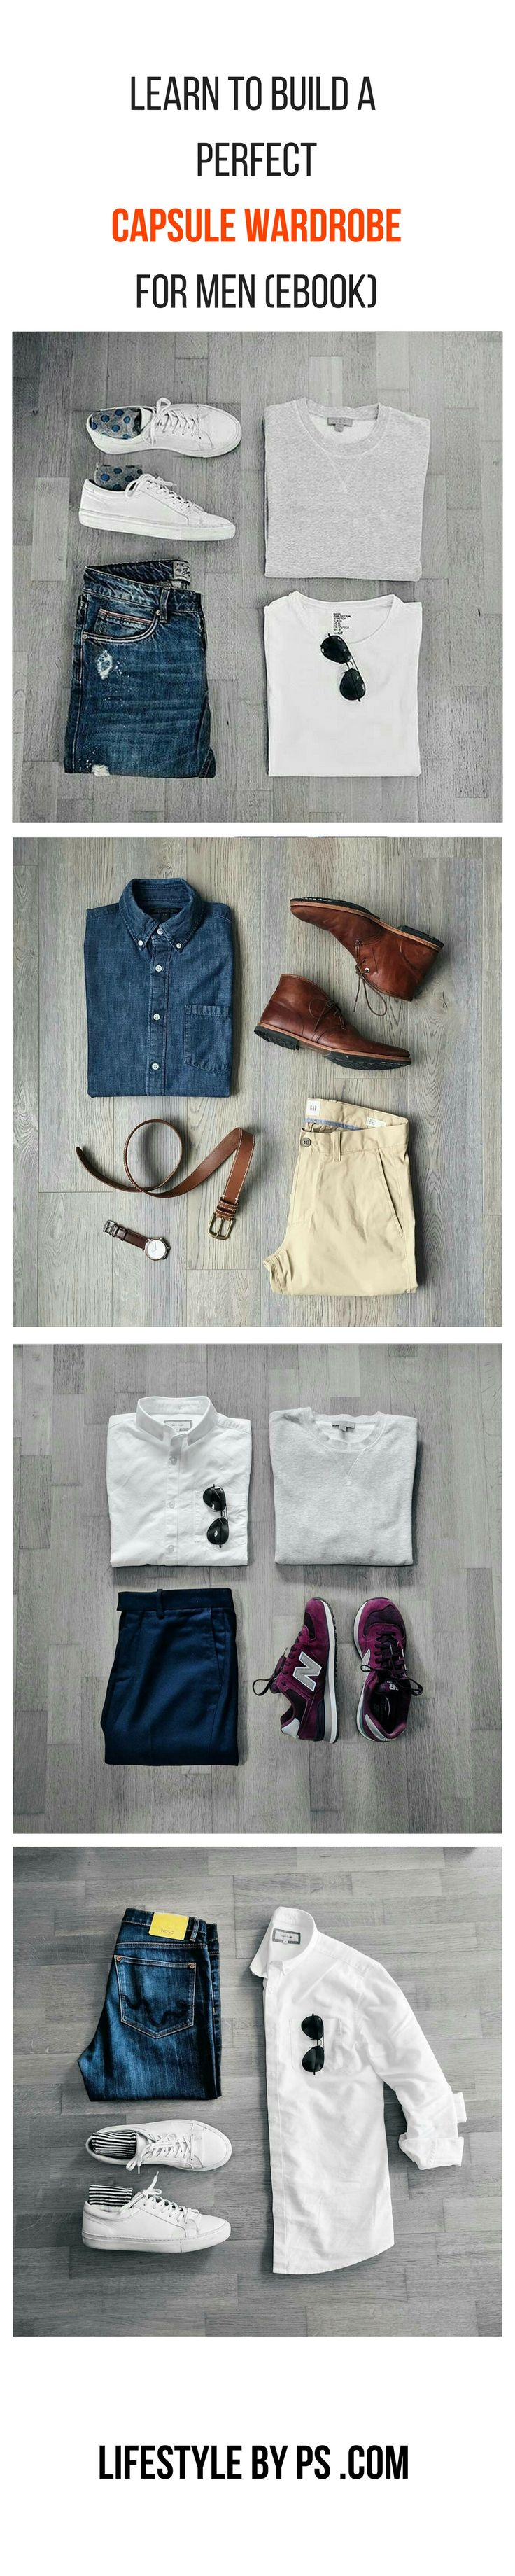 capsule wardrobe for men ebook men s fashion